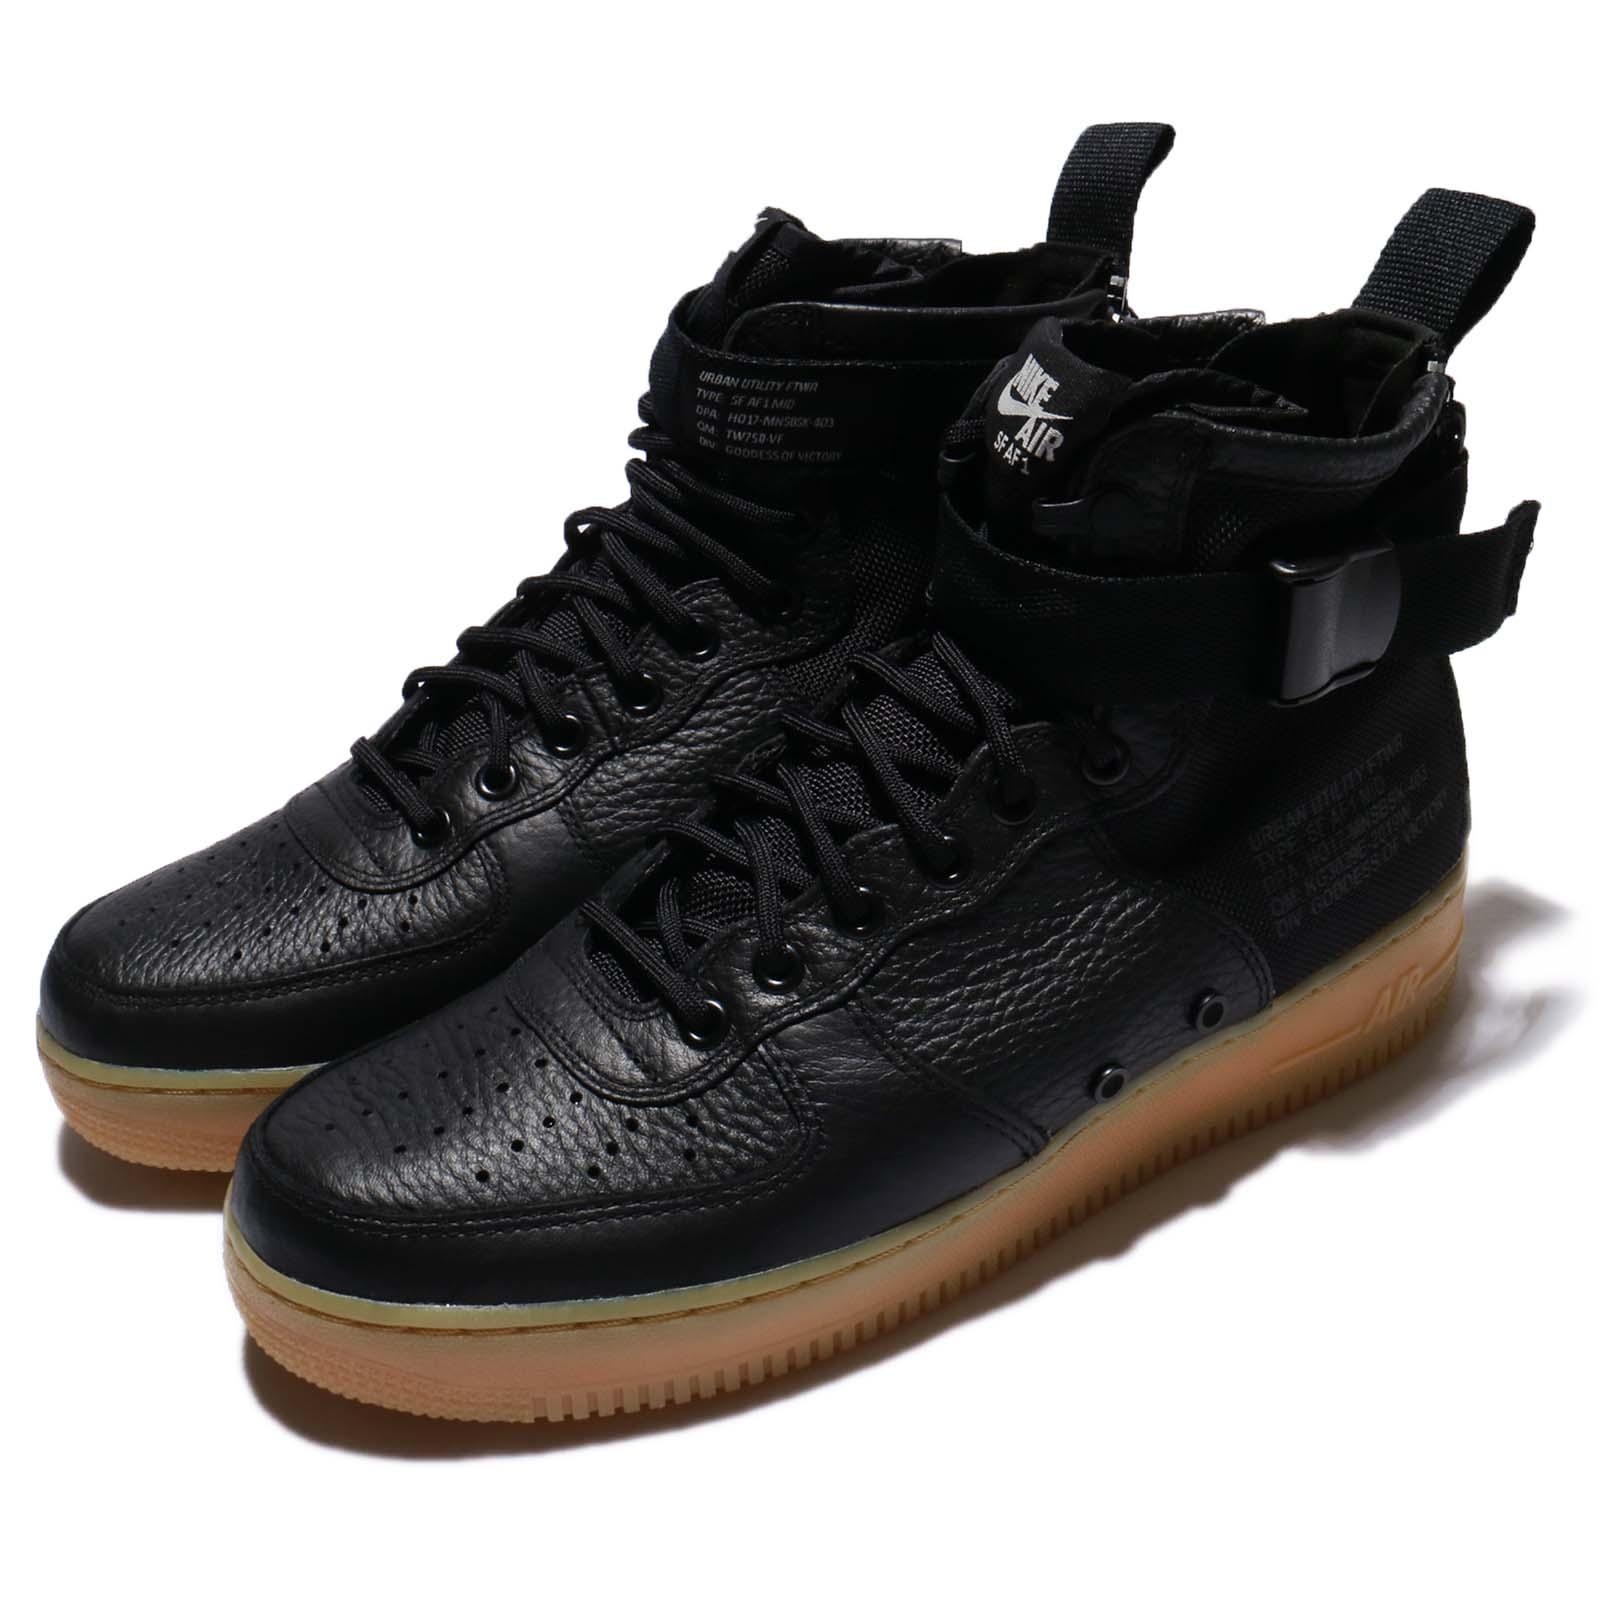 Nike 休閒鞋 SF AF1 Mid 復古 男鞋 917753-003